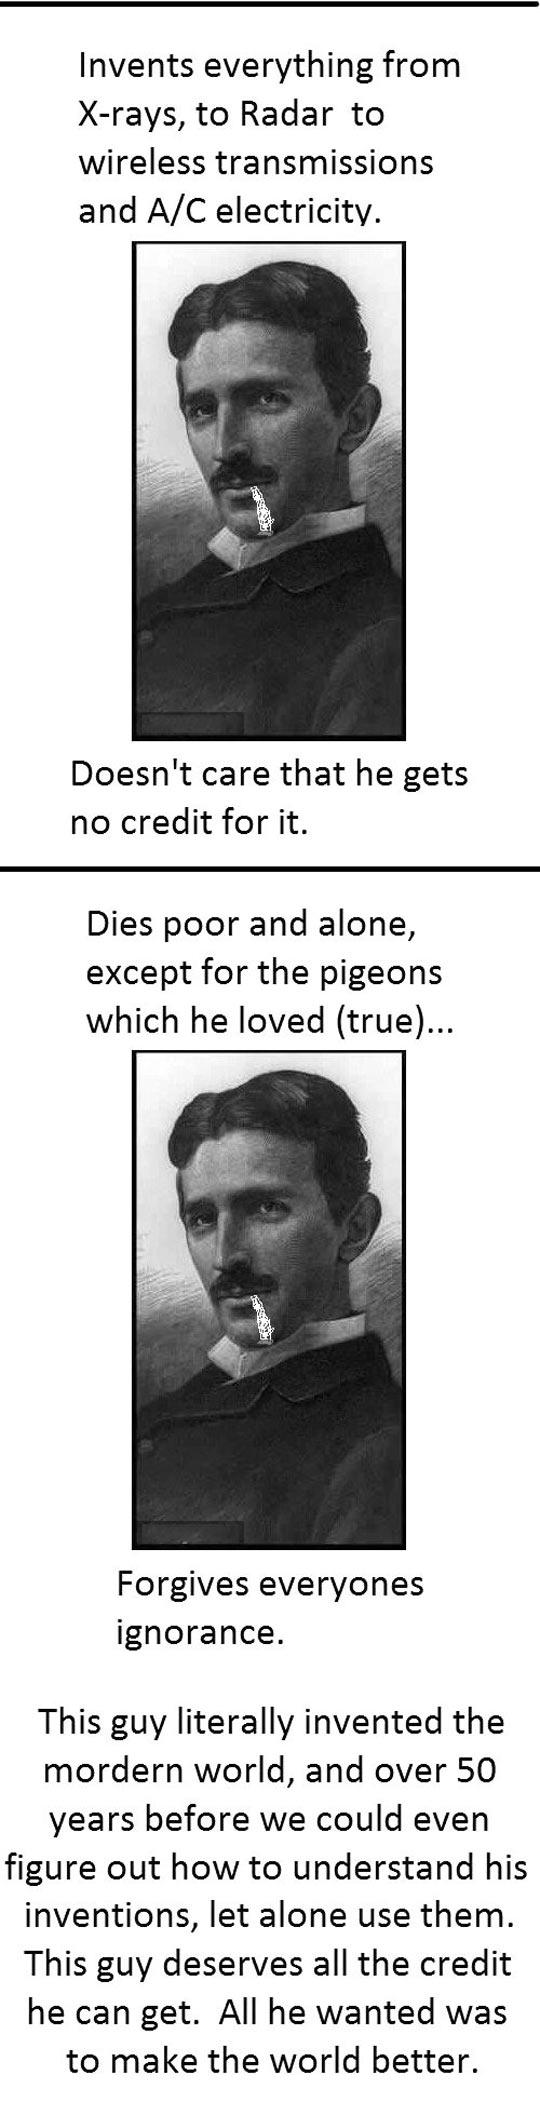 cool-Nikola-Tesla-good-guy-meme